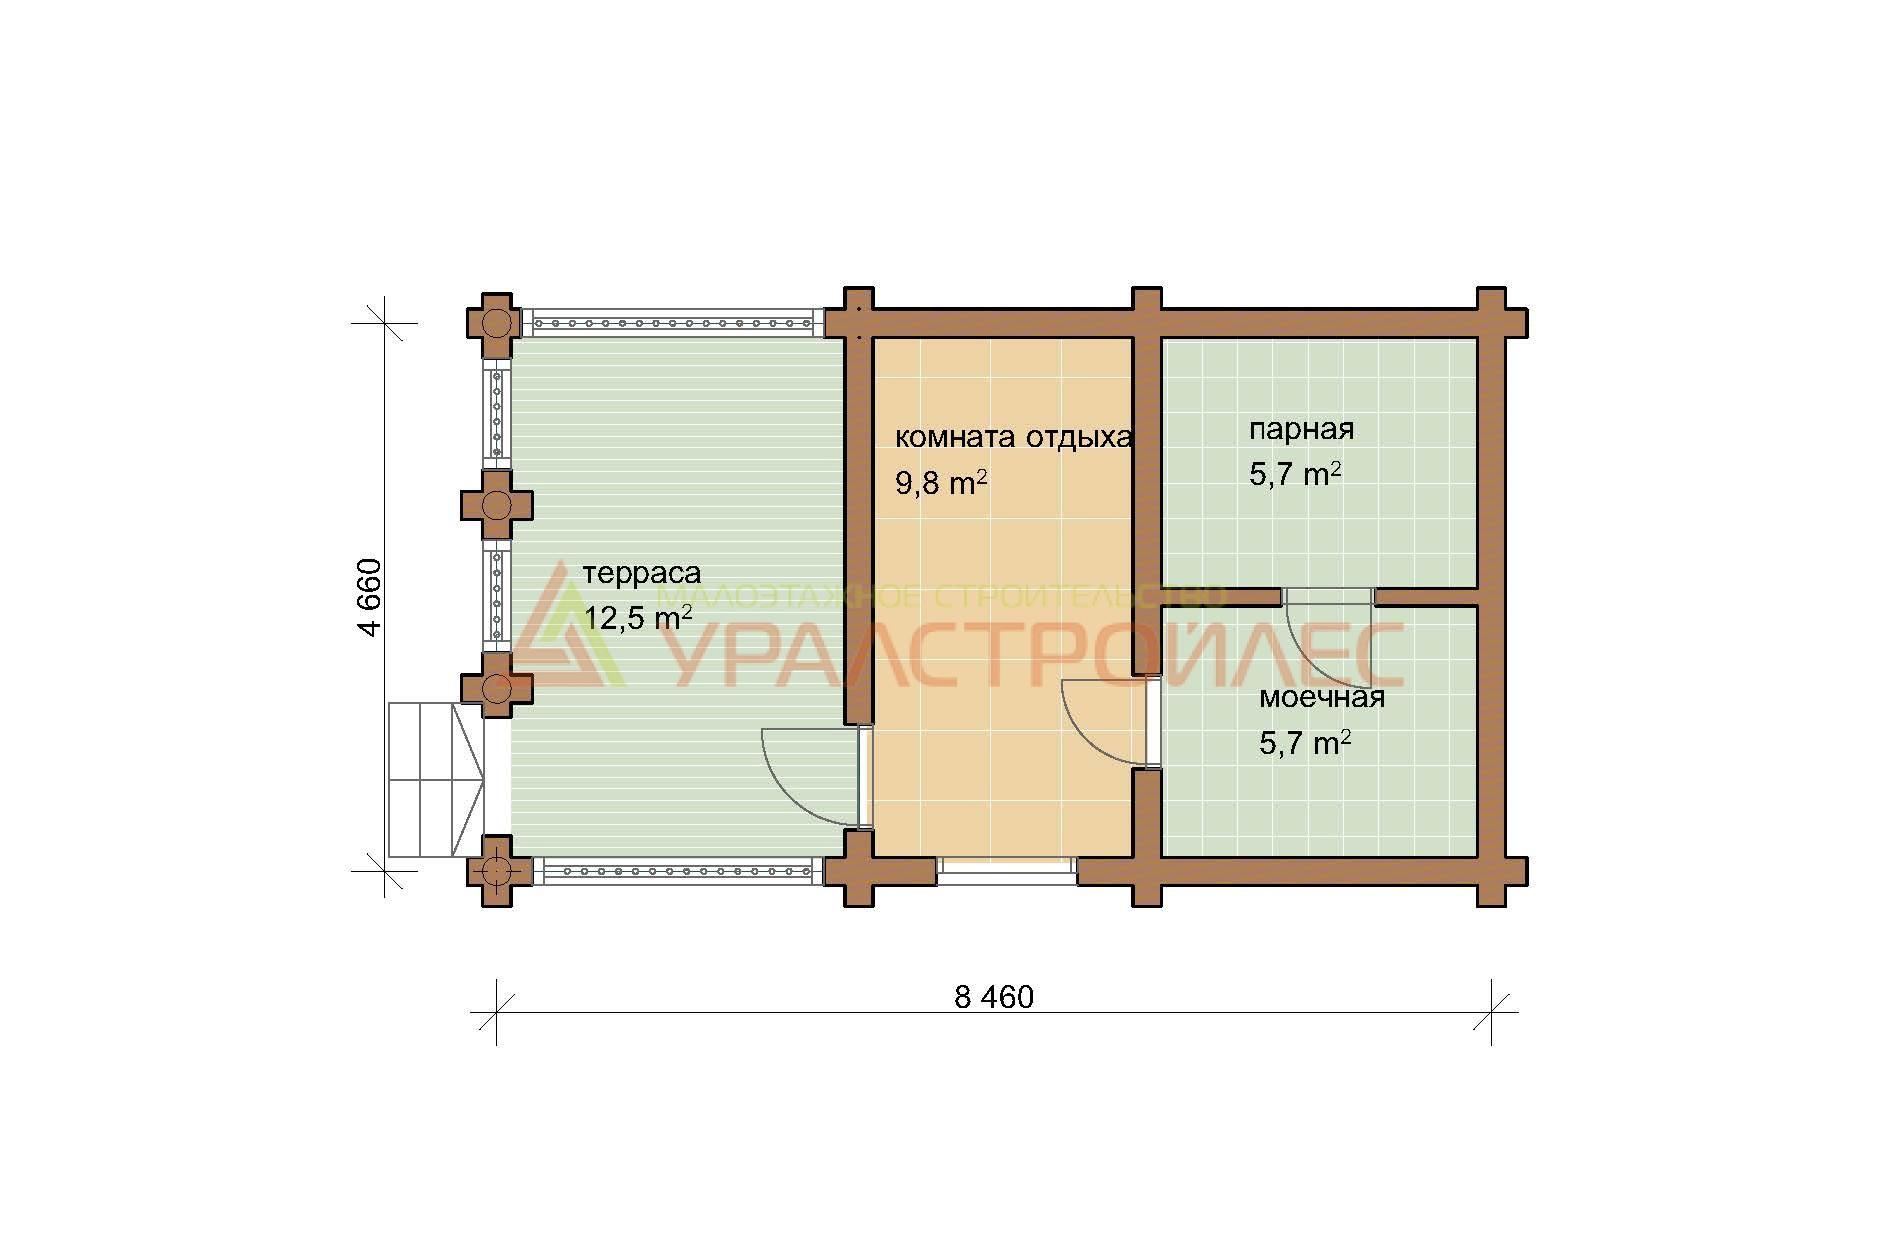 Проект №474, баня, общая площадь 34.6 кв.м. (диаметр бревна 240)